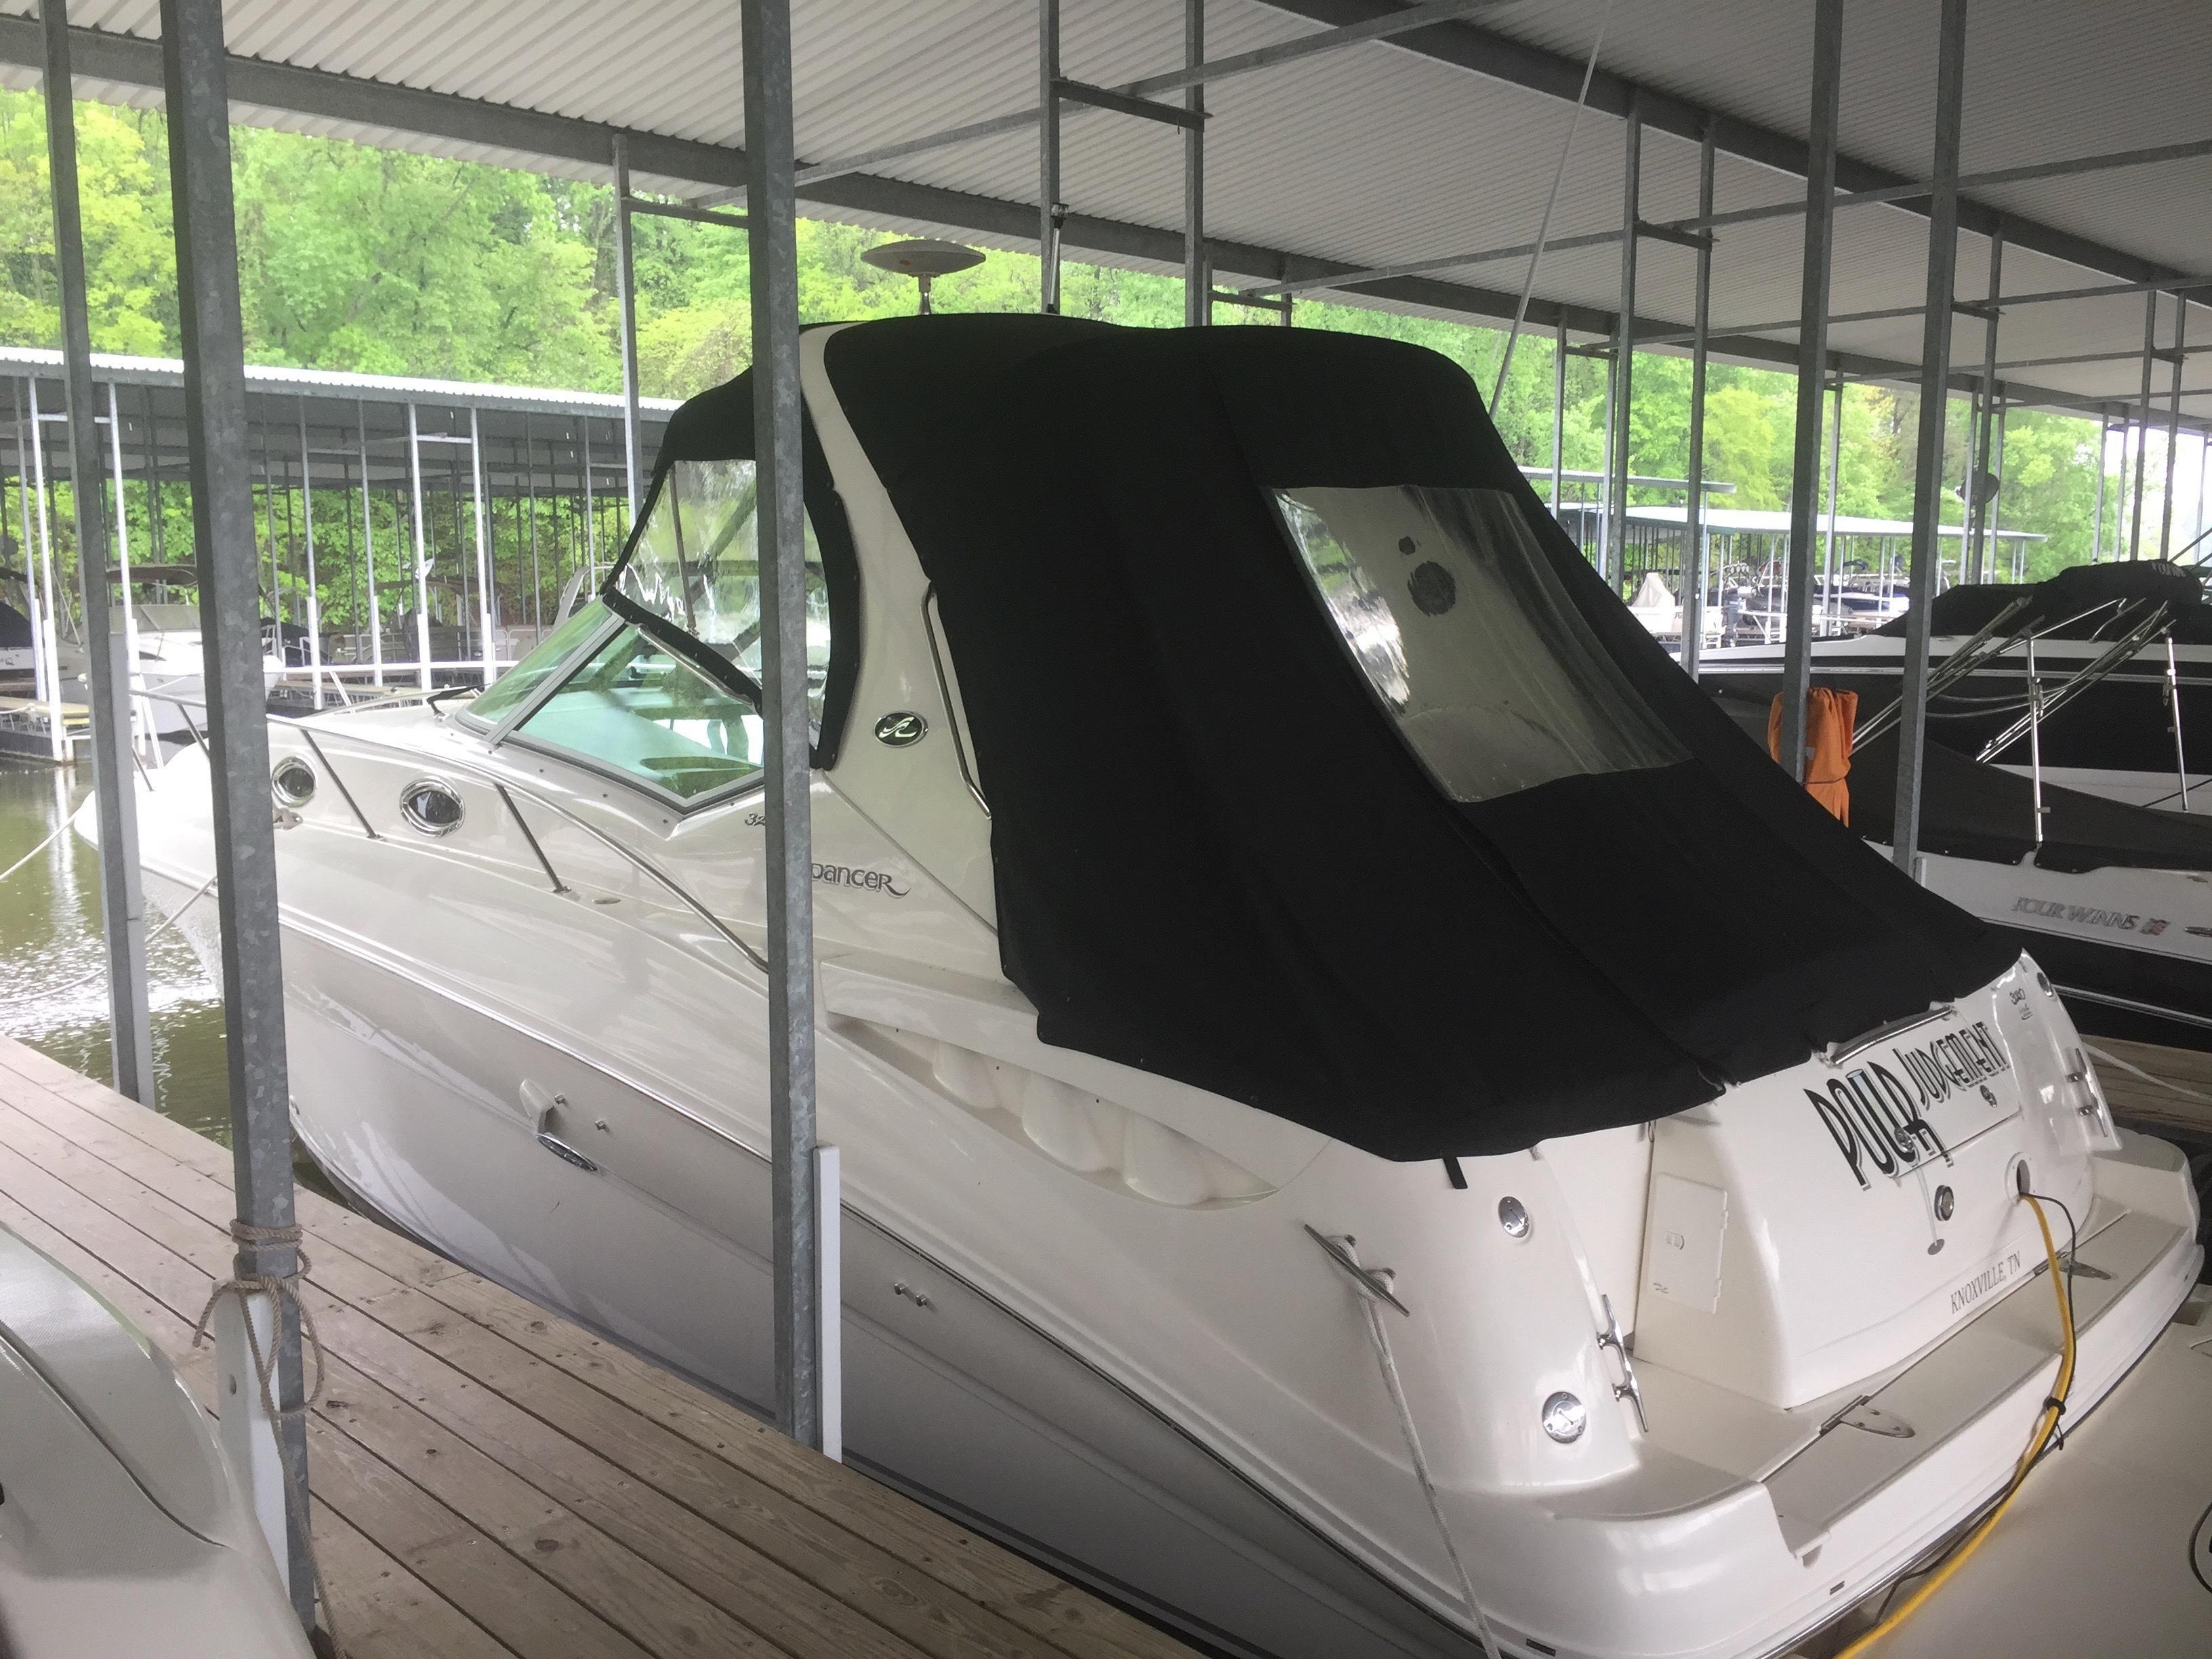 2004 Sea Ray 320 Sundancer Power Boat For Sale Www